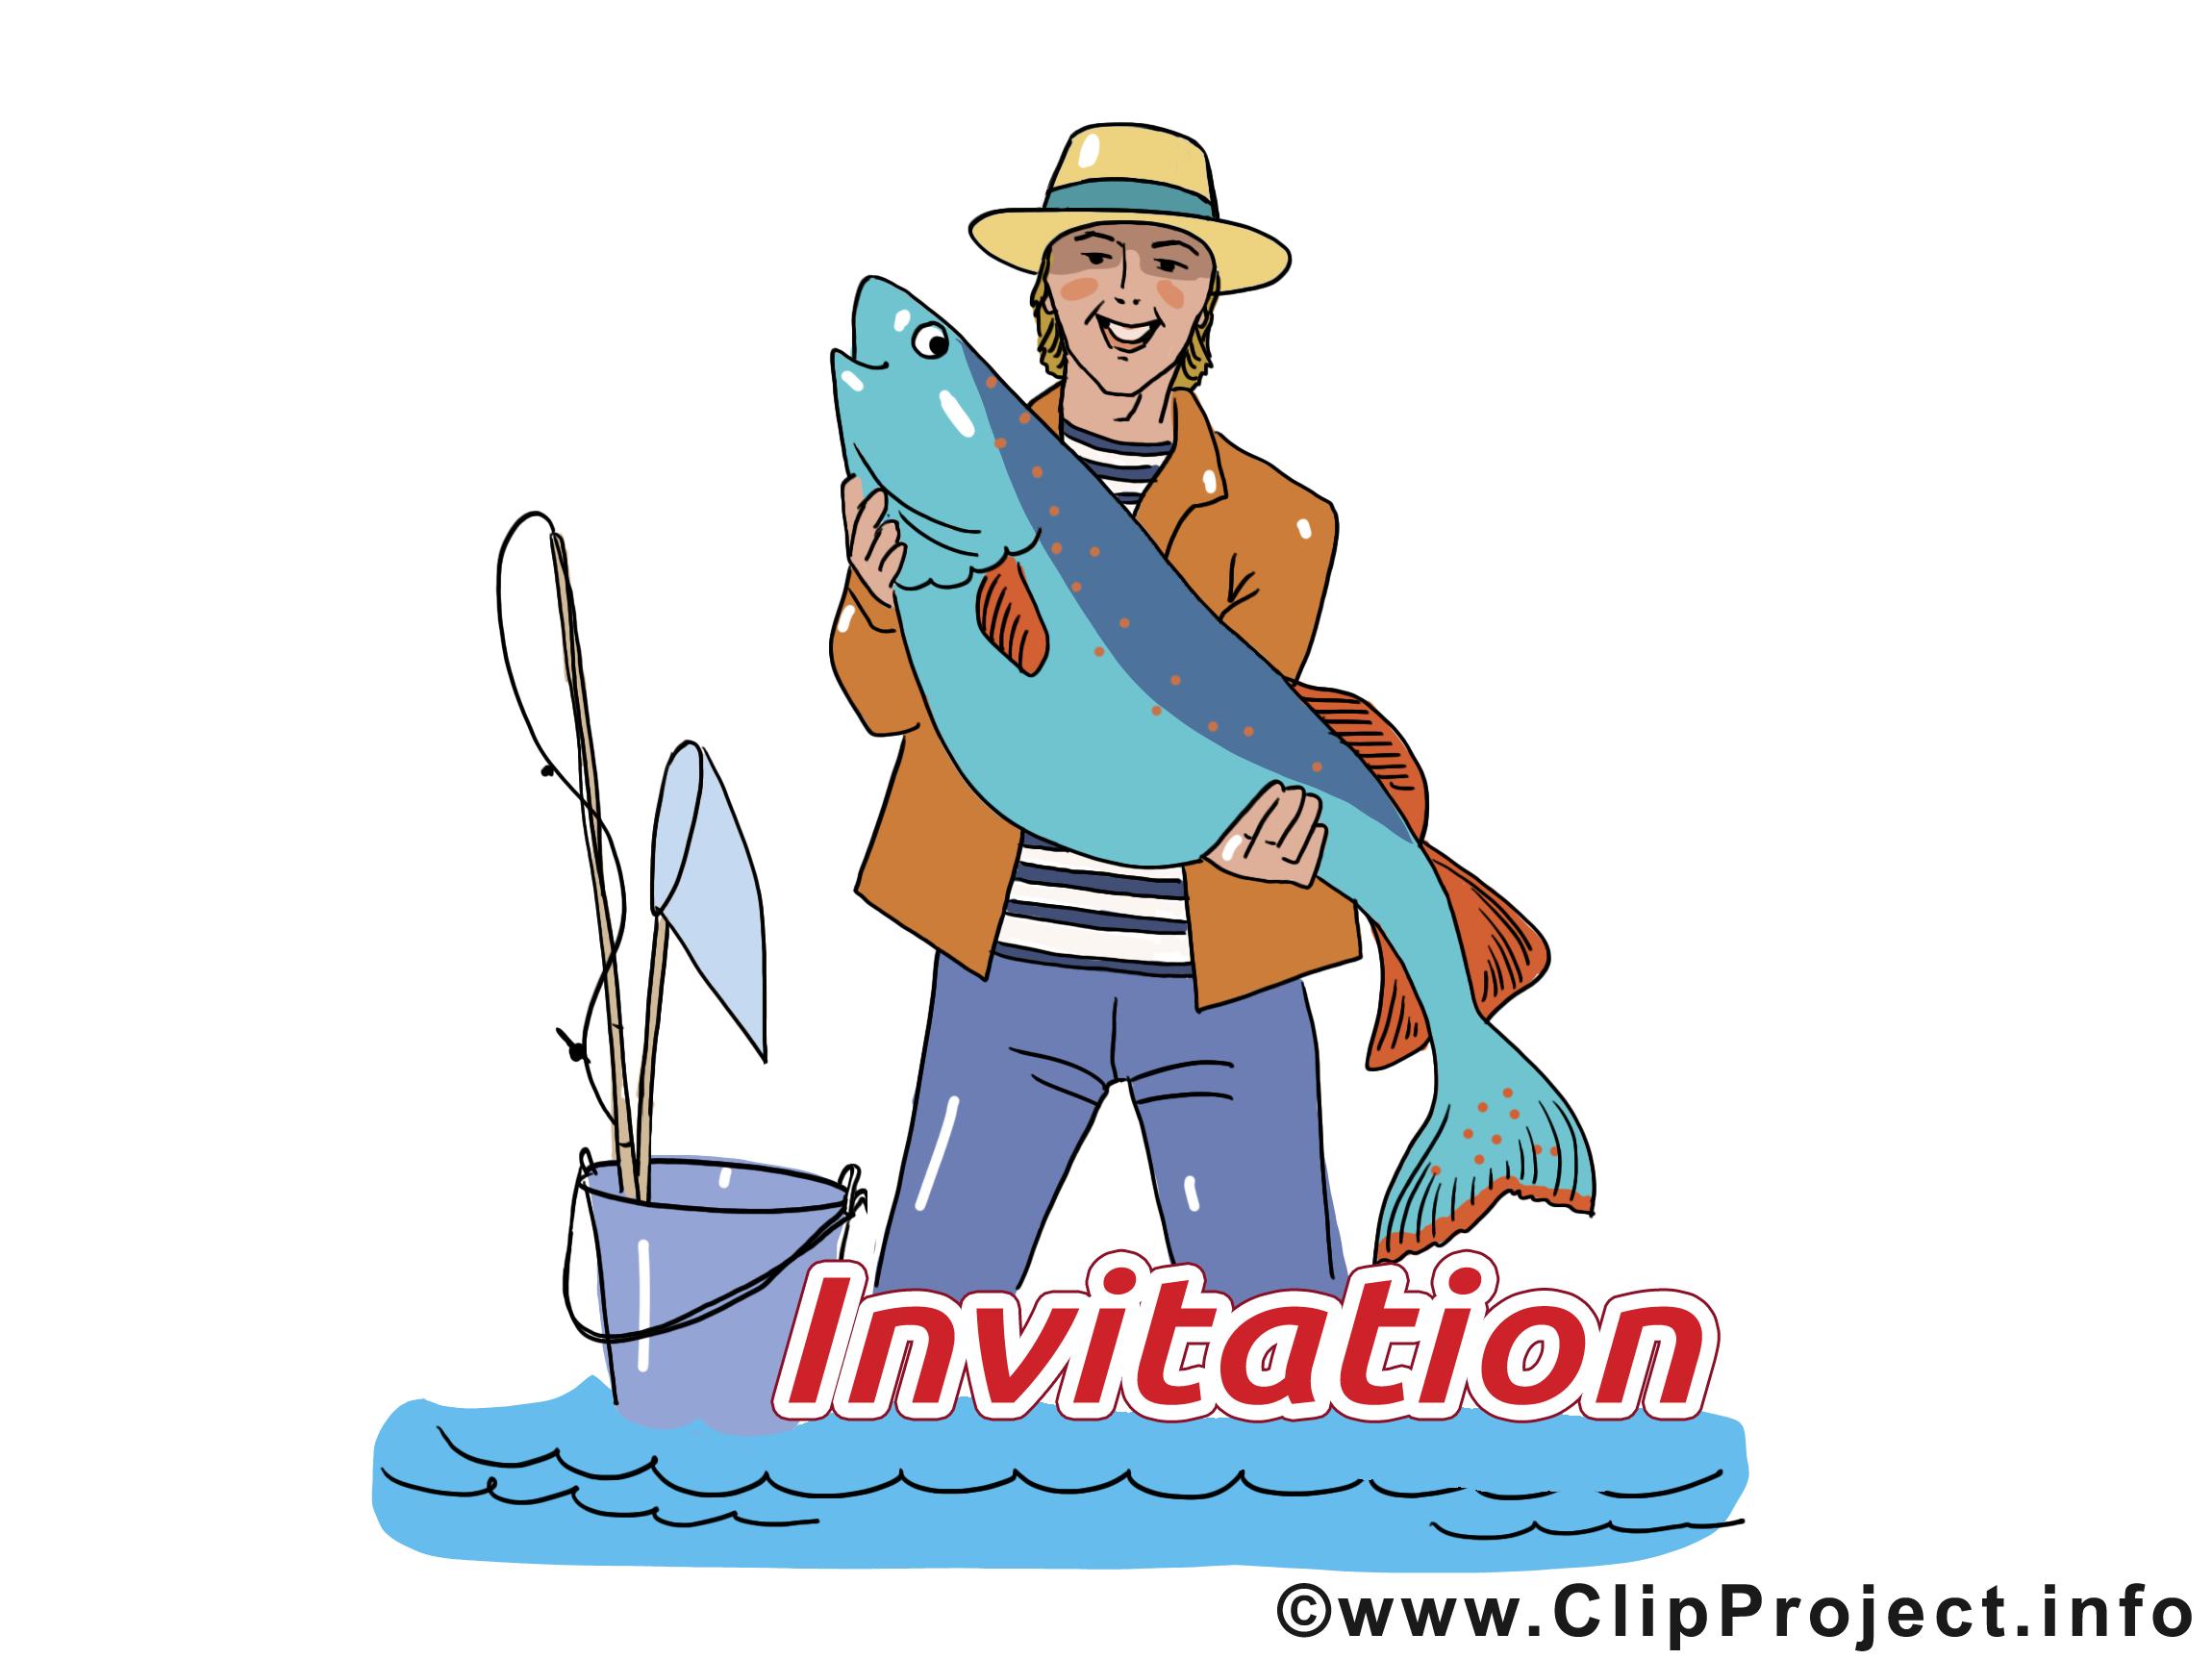 Pêcheur illustration - Invitation clipart